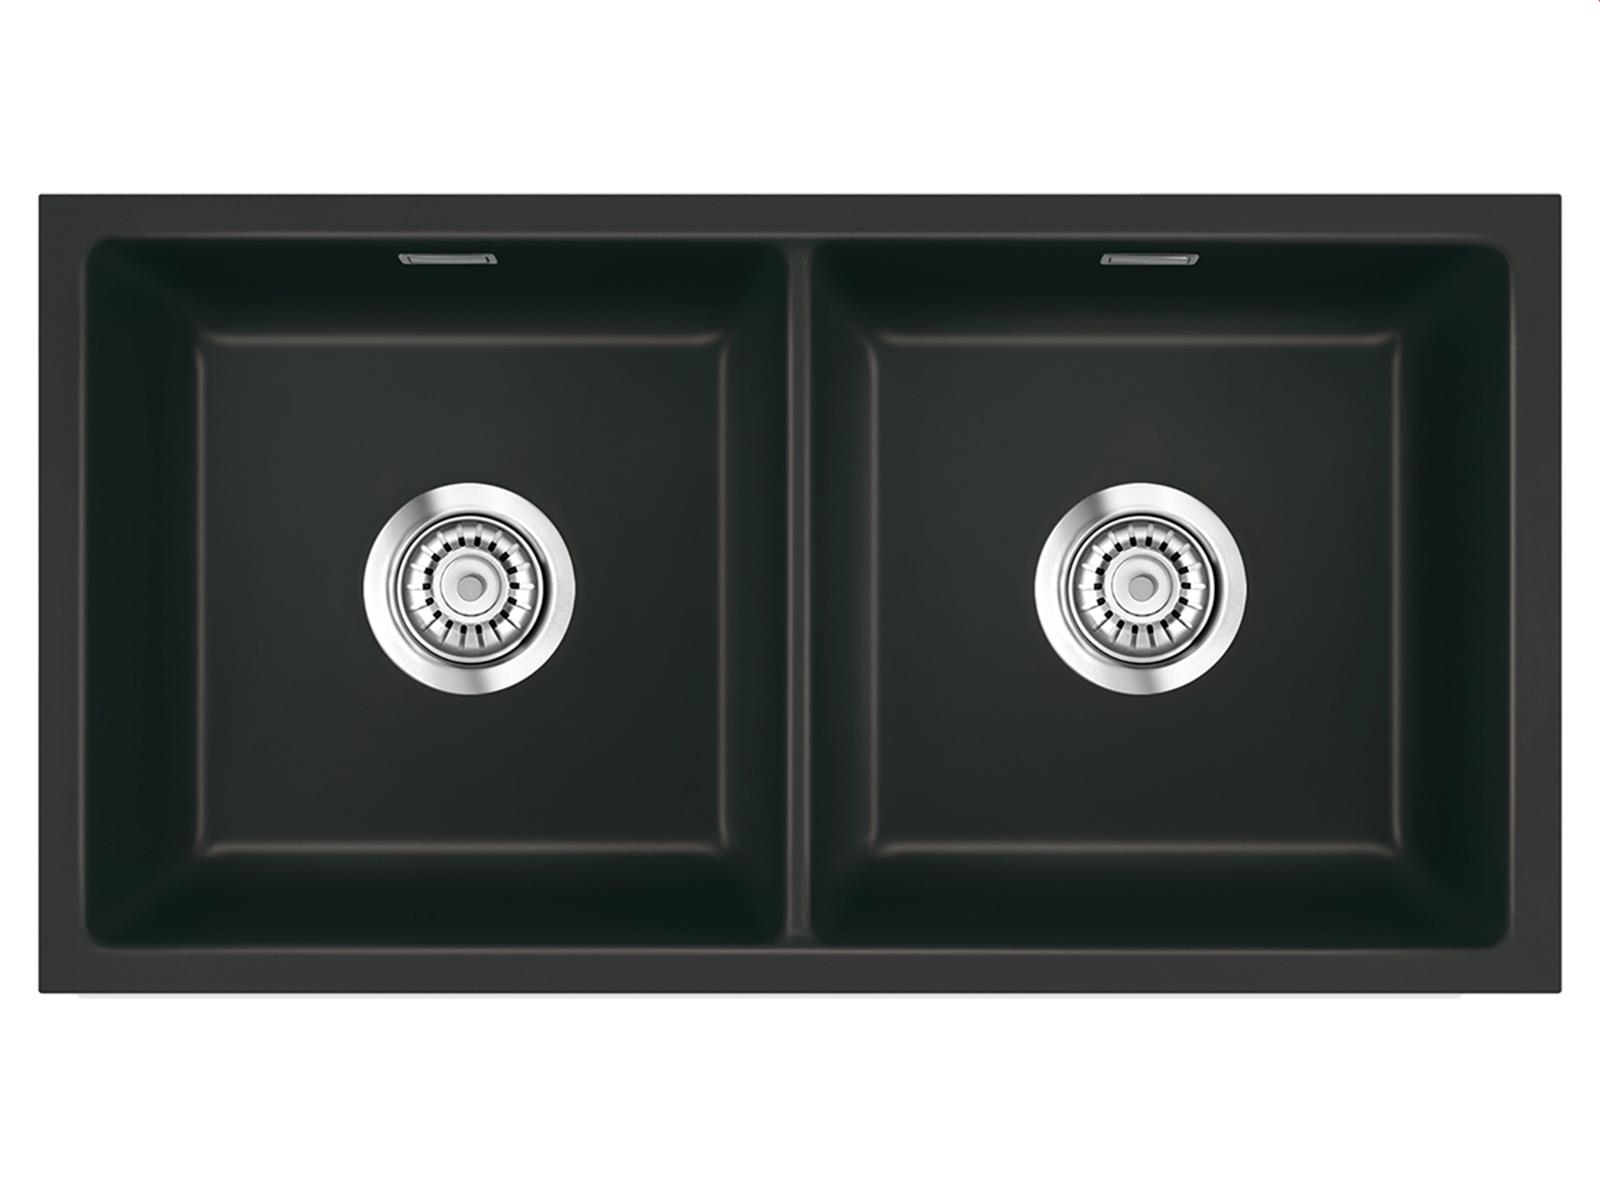 Systemceram Mera Twin U Nigra Keramikspüle Excenterbetätigung